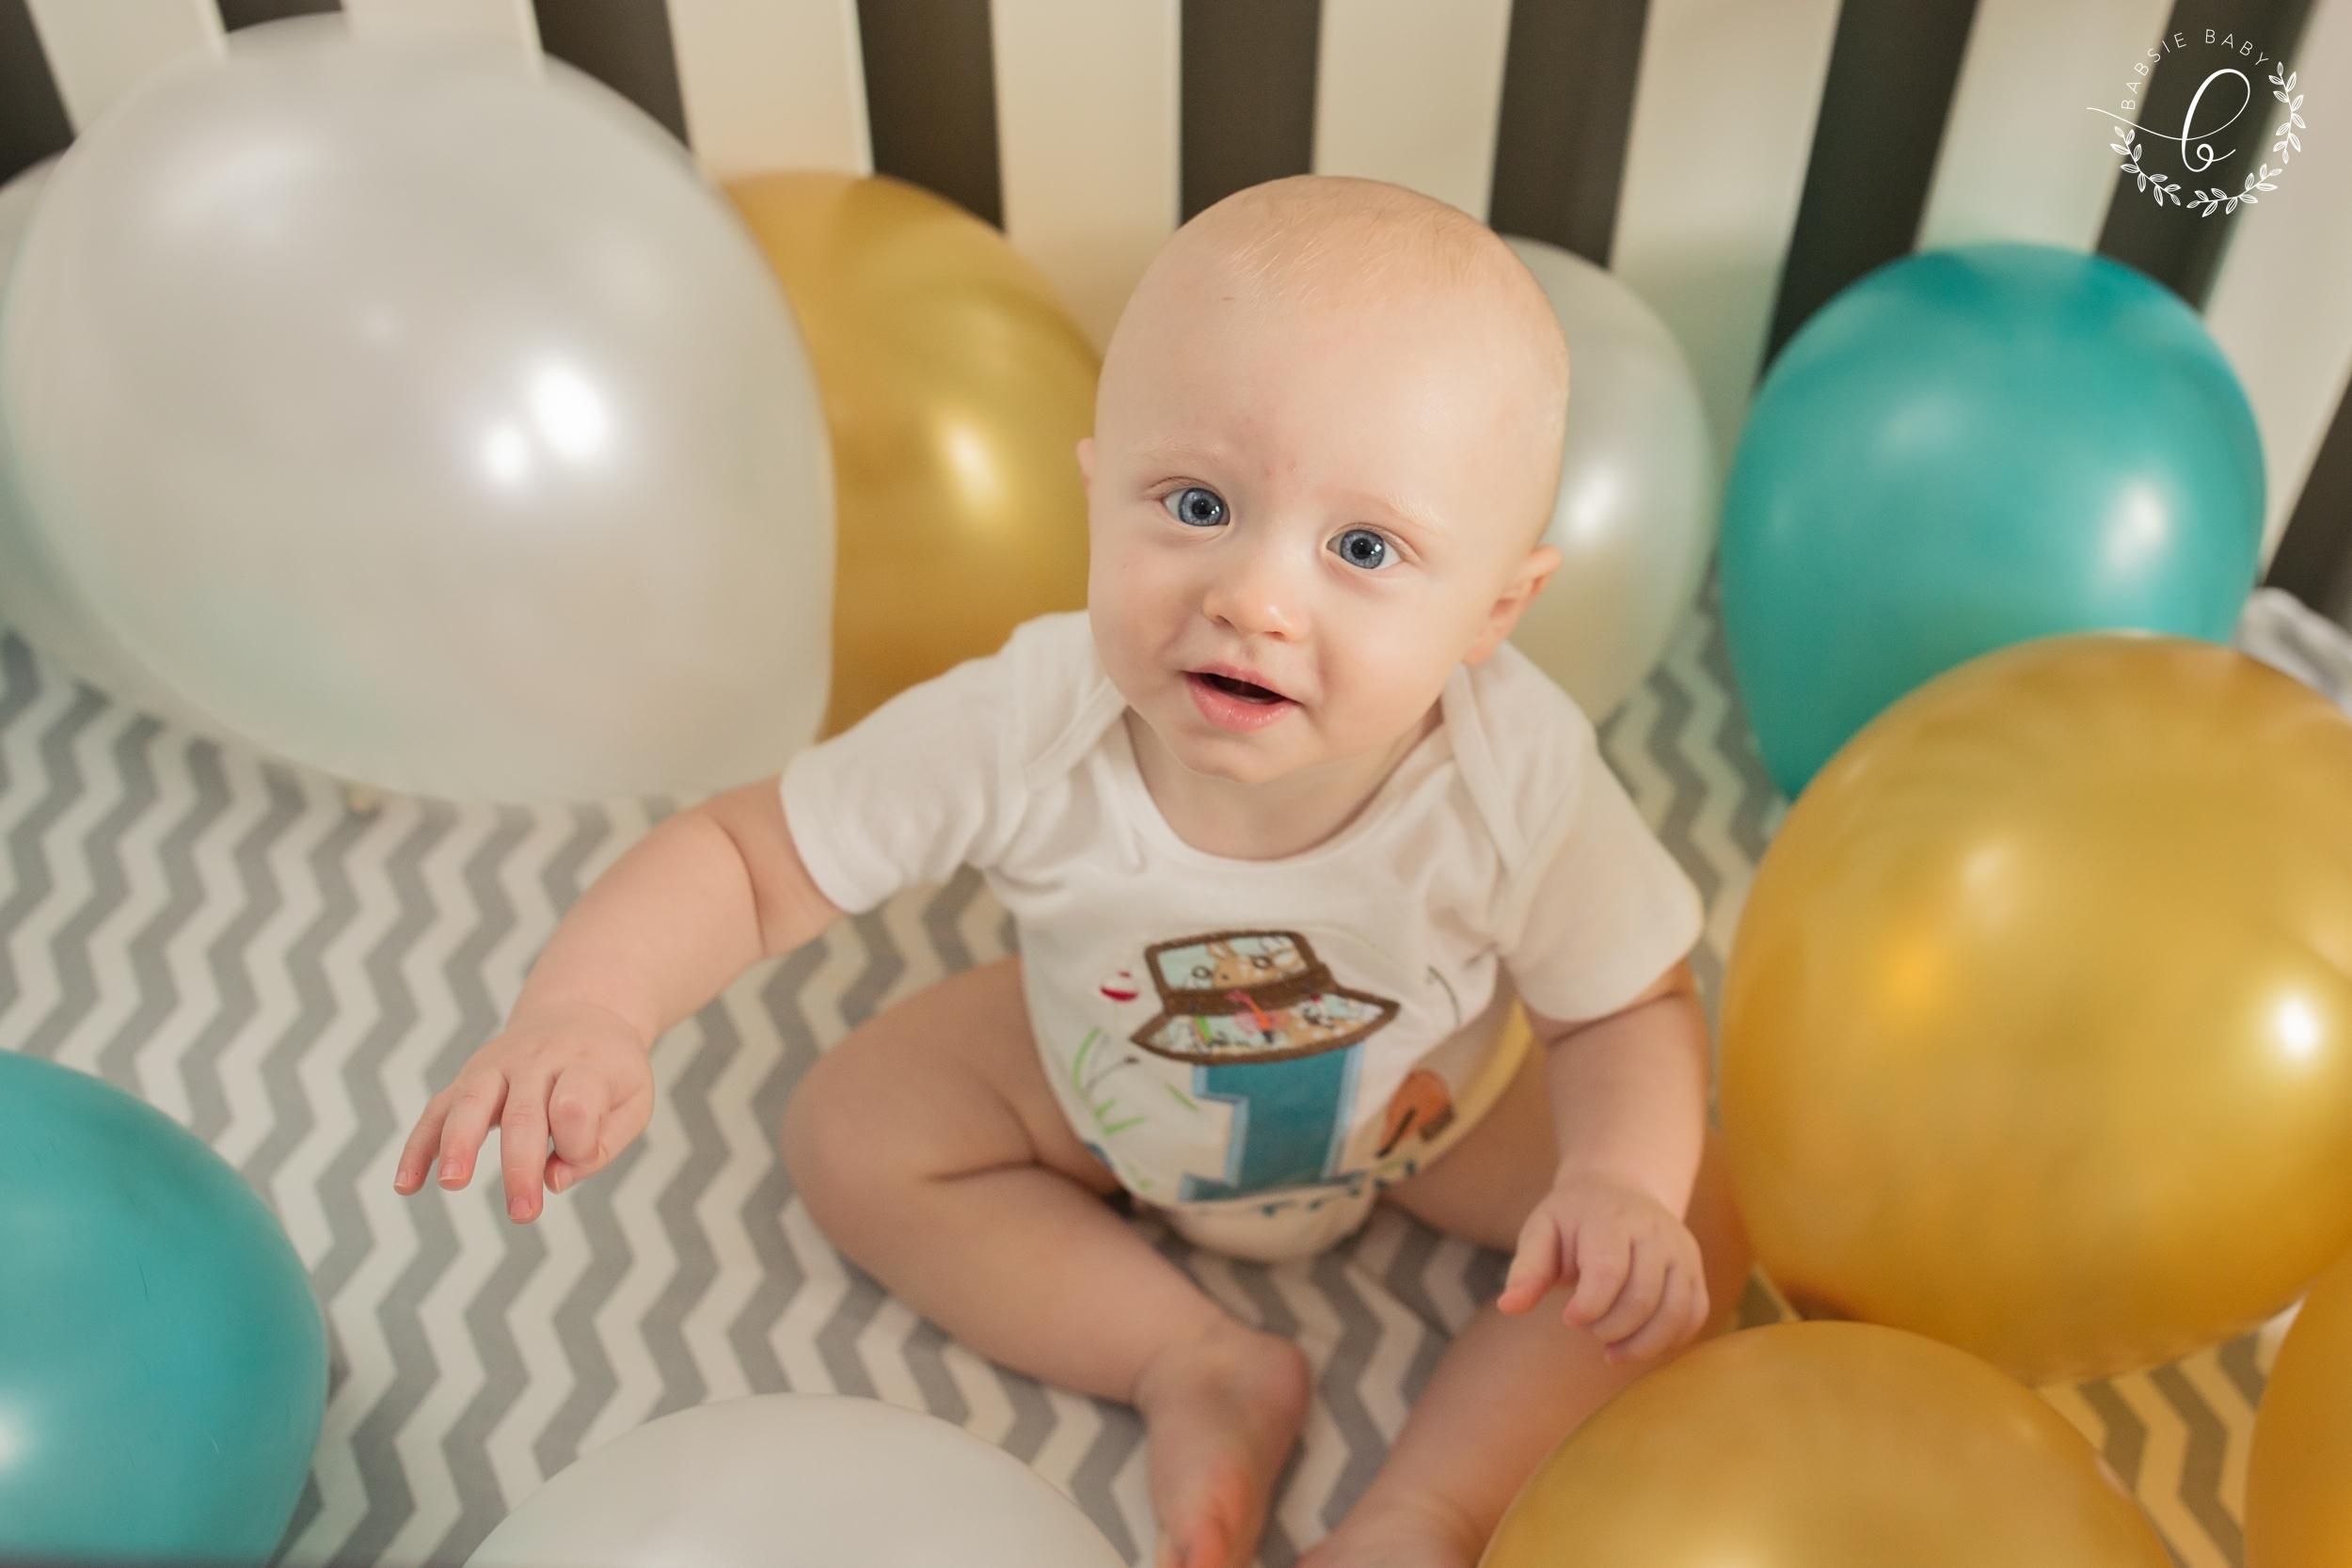 Babsie-Baby-Photography-Colton-1-Year-Old-Birthday-San-Diego-Oceanside-California-005.JPG